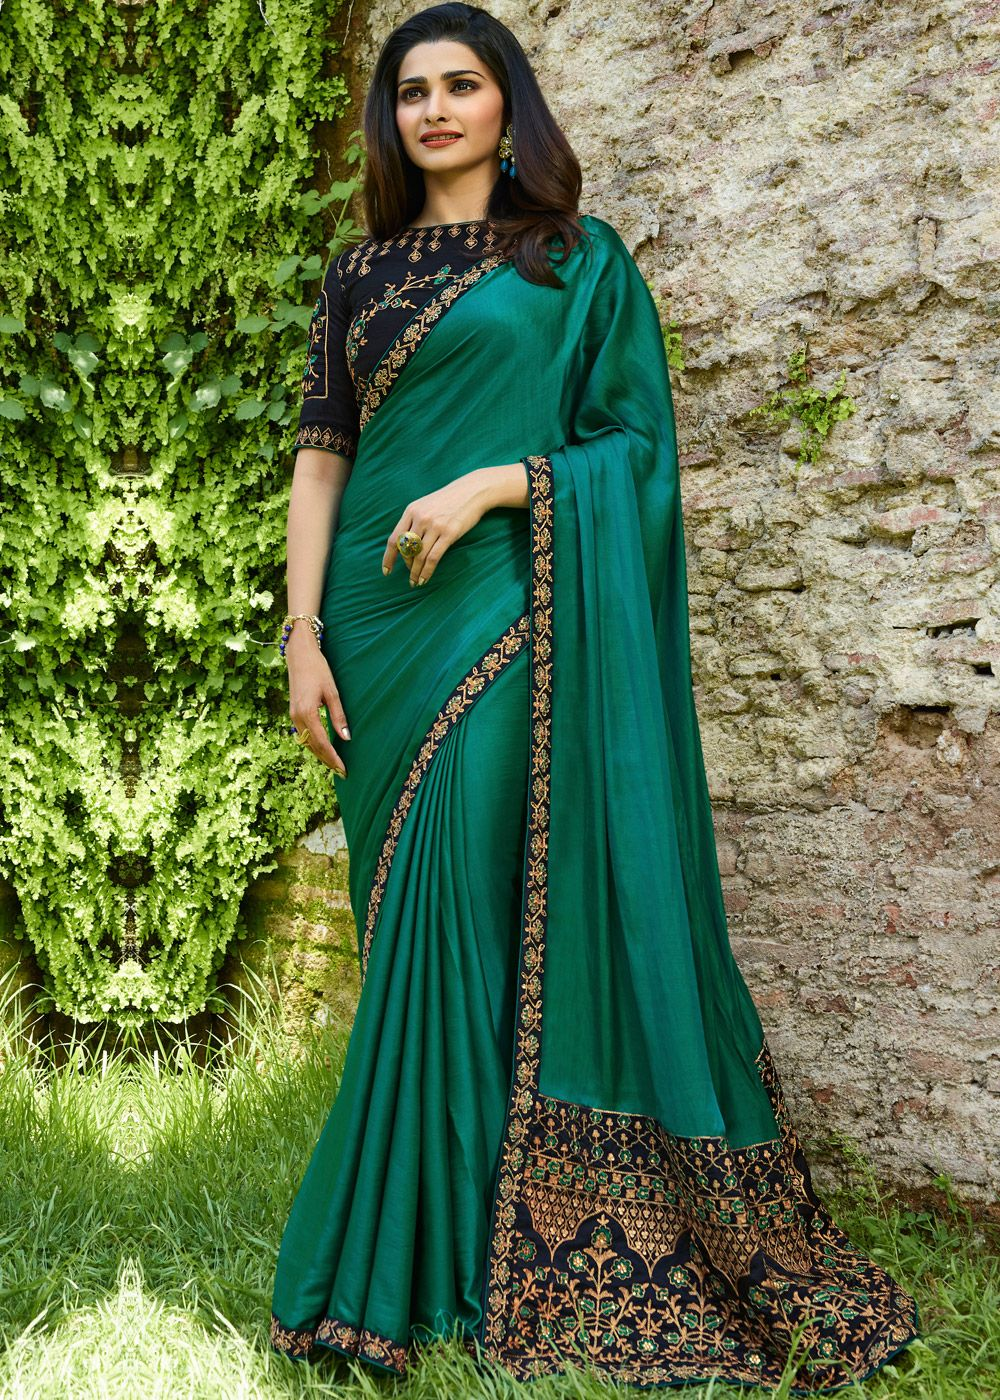 Bottle Green Color Wrinkle Chiffon Printed Sarees Mastani Collection Yf 23541 Stylish Sarees Party Wear Sarees Silk Saree Blouse Designs